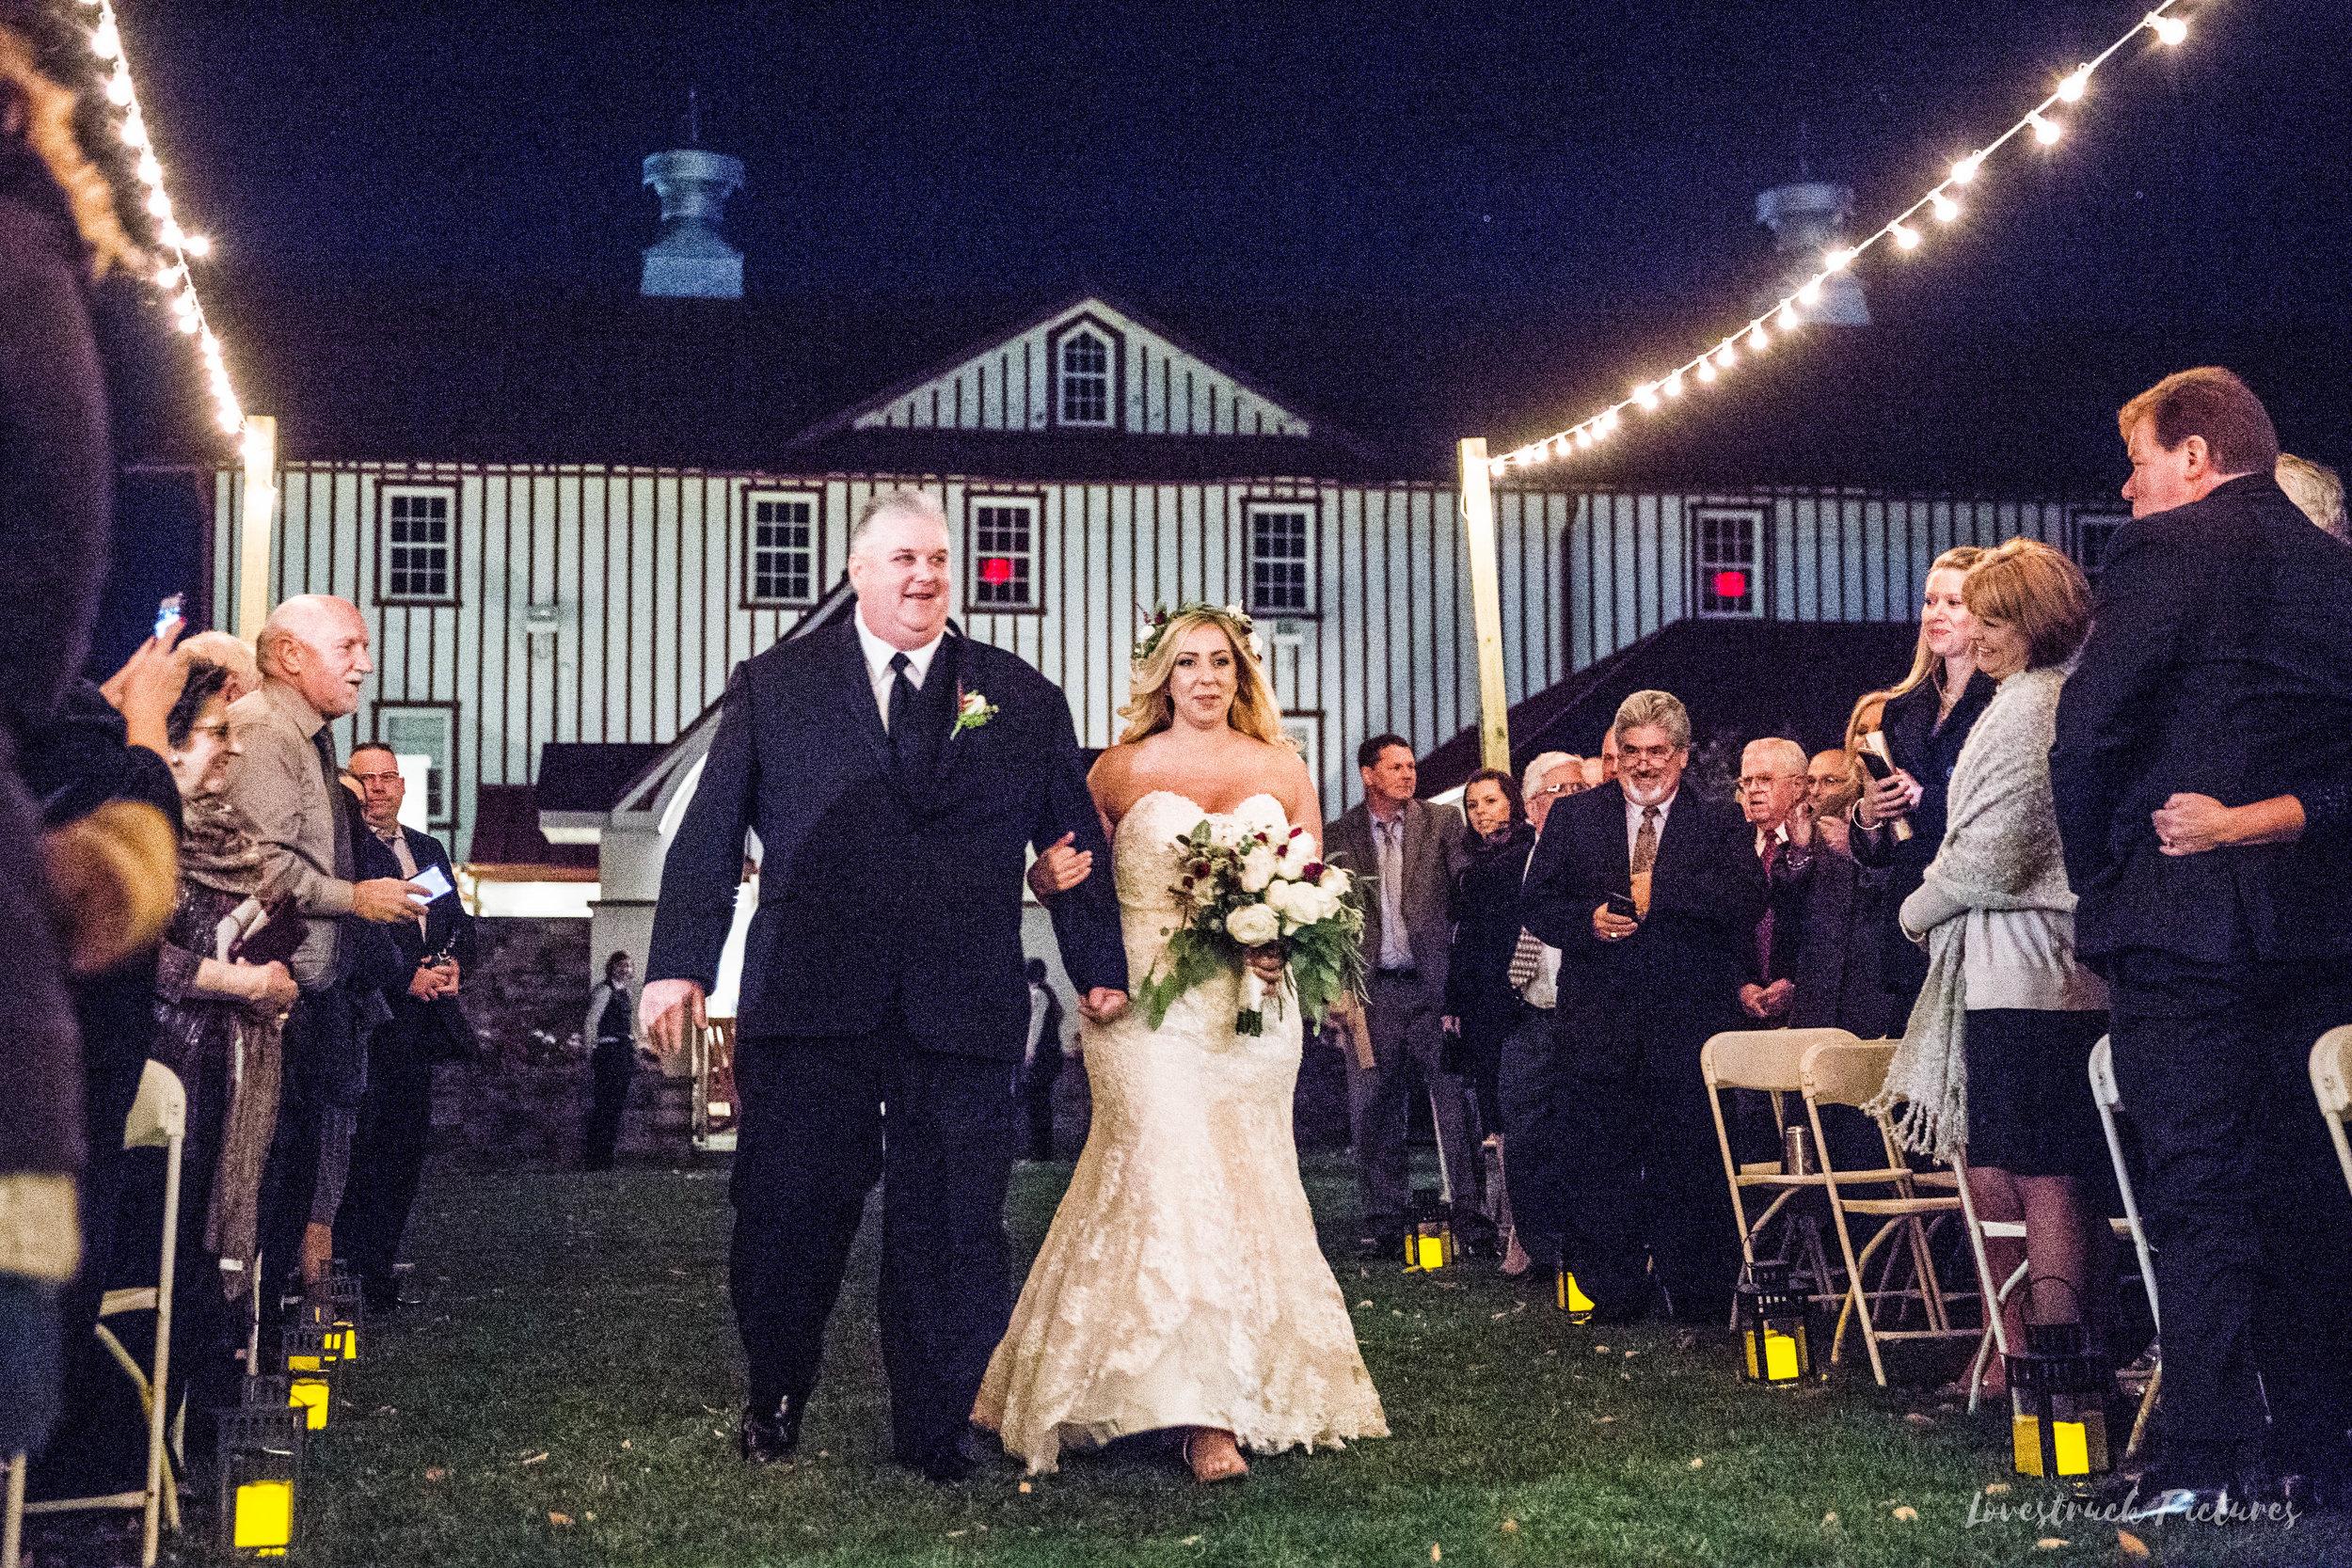 NORMANDY_FARMS_WEDDING_BLUEBELL_PA--48.jpg